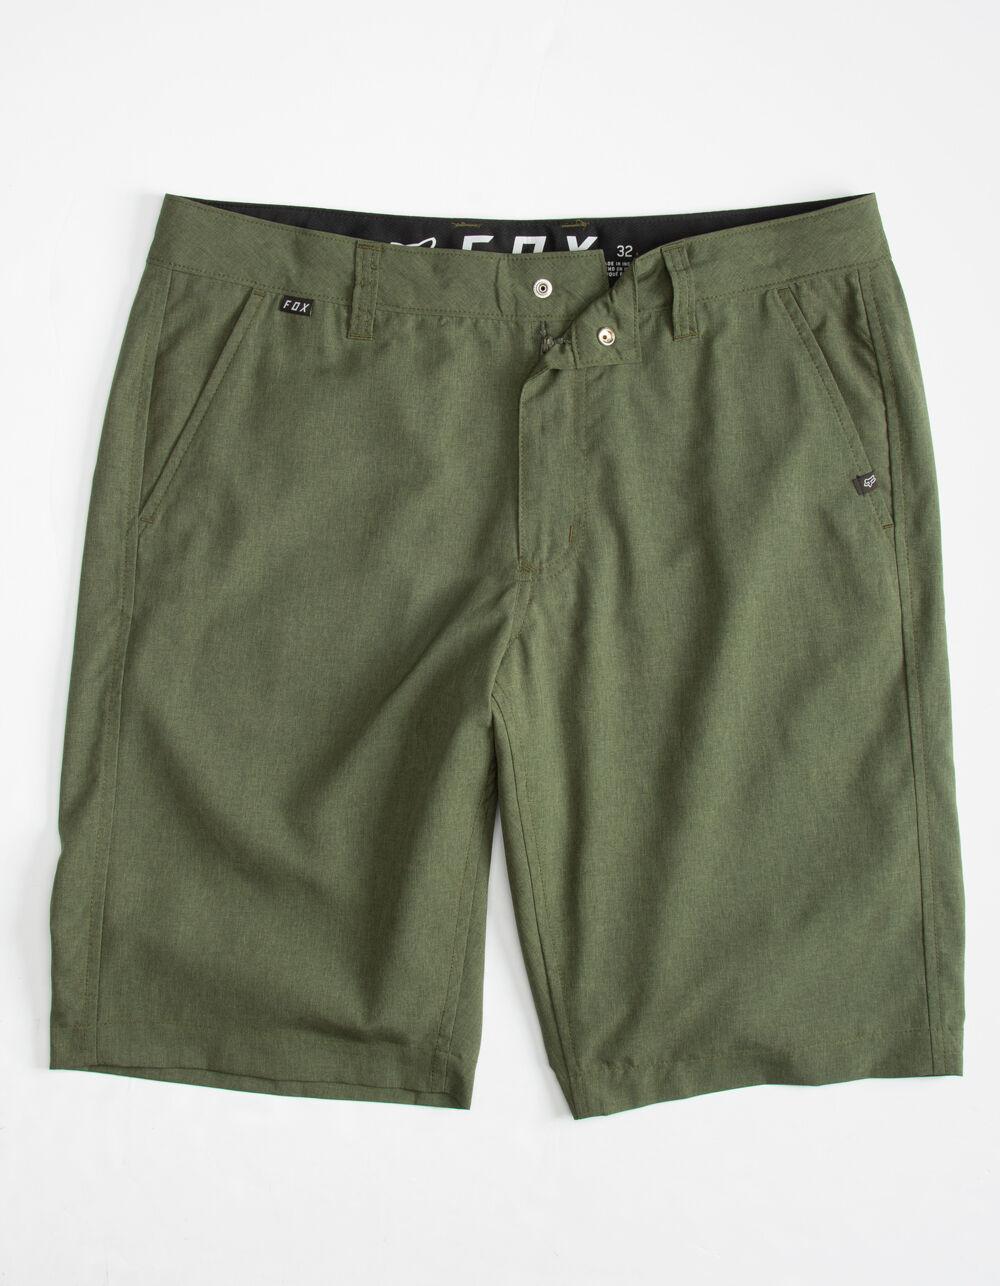 FOX Essex Tech Olive Hybrid Shorts